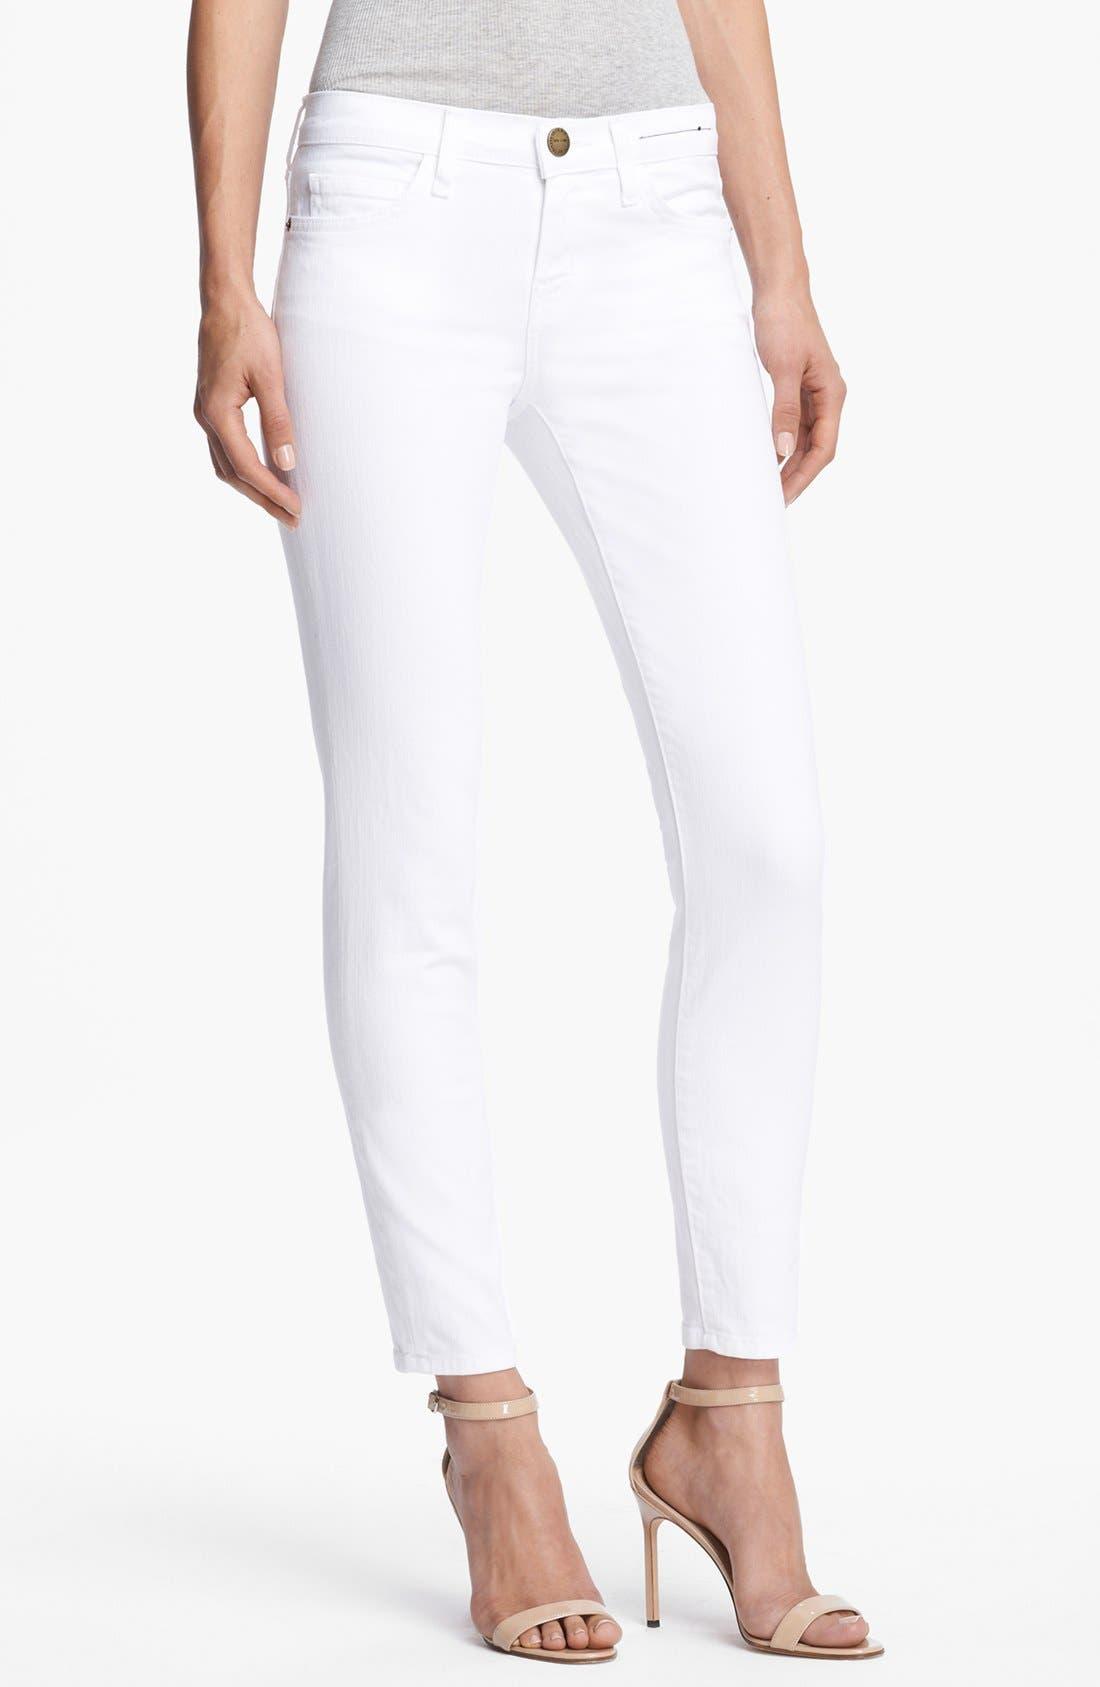 Main Image - Current/Elliott 'The Stiletto' Jeans (Sugar)